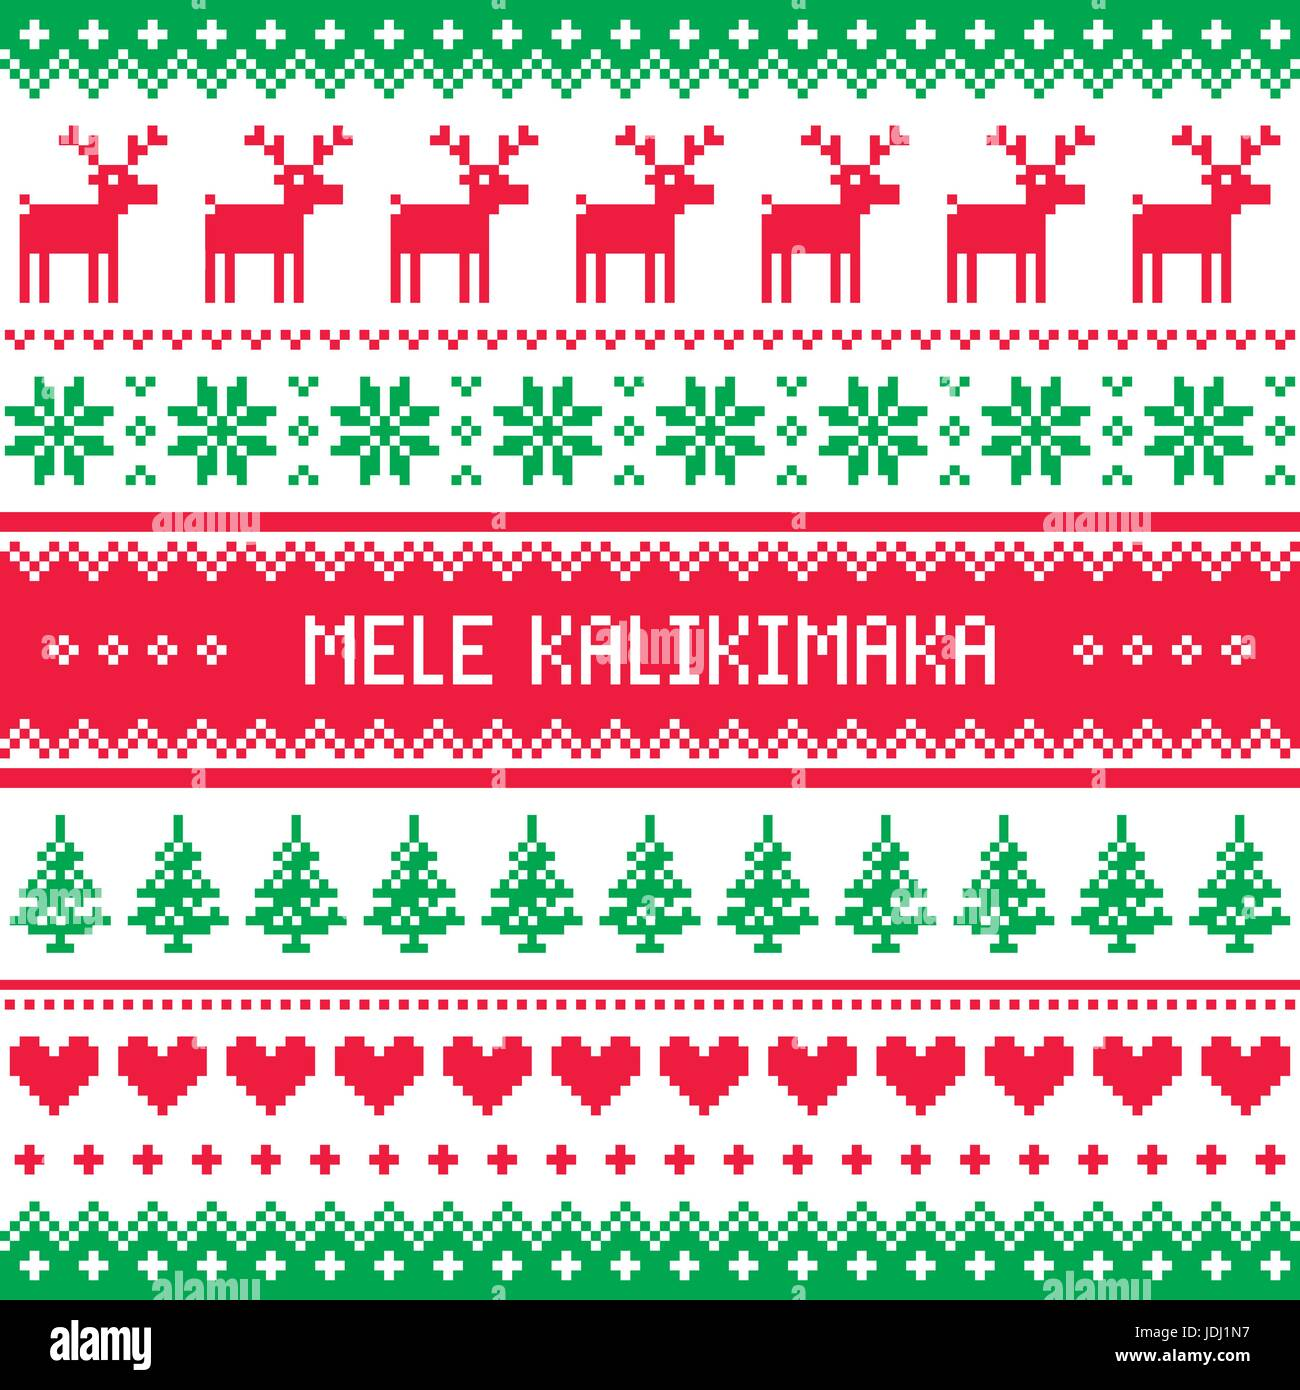 Mele Kalikimaka - Merry Christmas in Hawaiian greetings card Stock ...